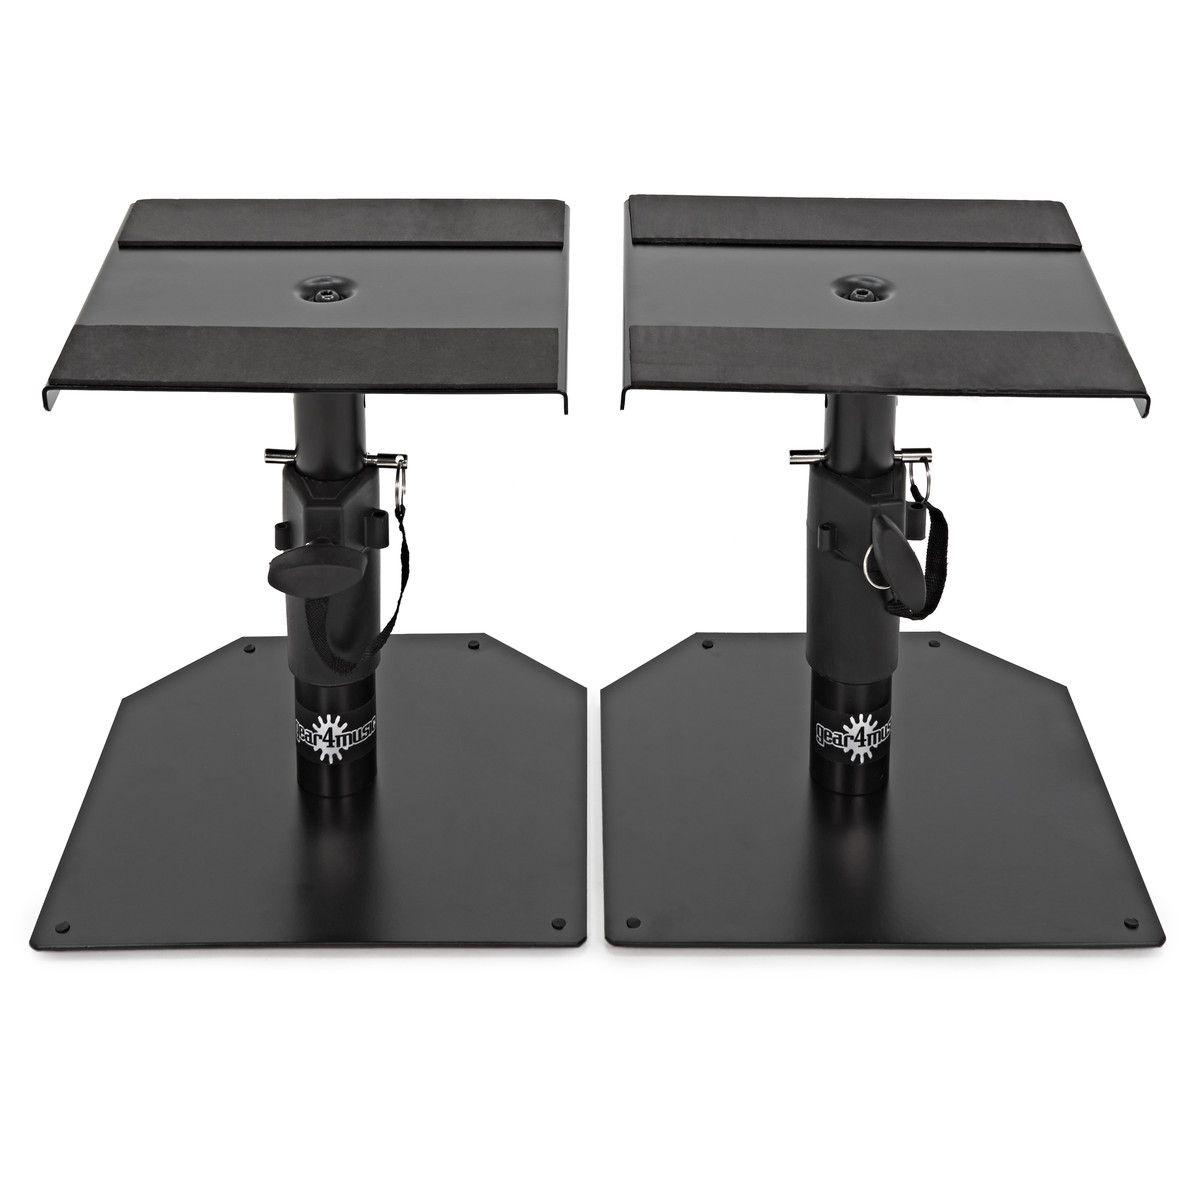 desktop monitor speaker stands by gear4music pair home studio recording desktop speakers. Black Bedroom Furniture Sets. Home Design Ideas